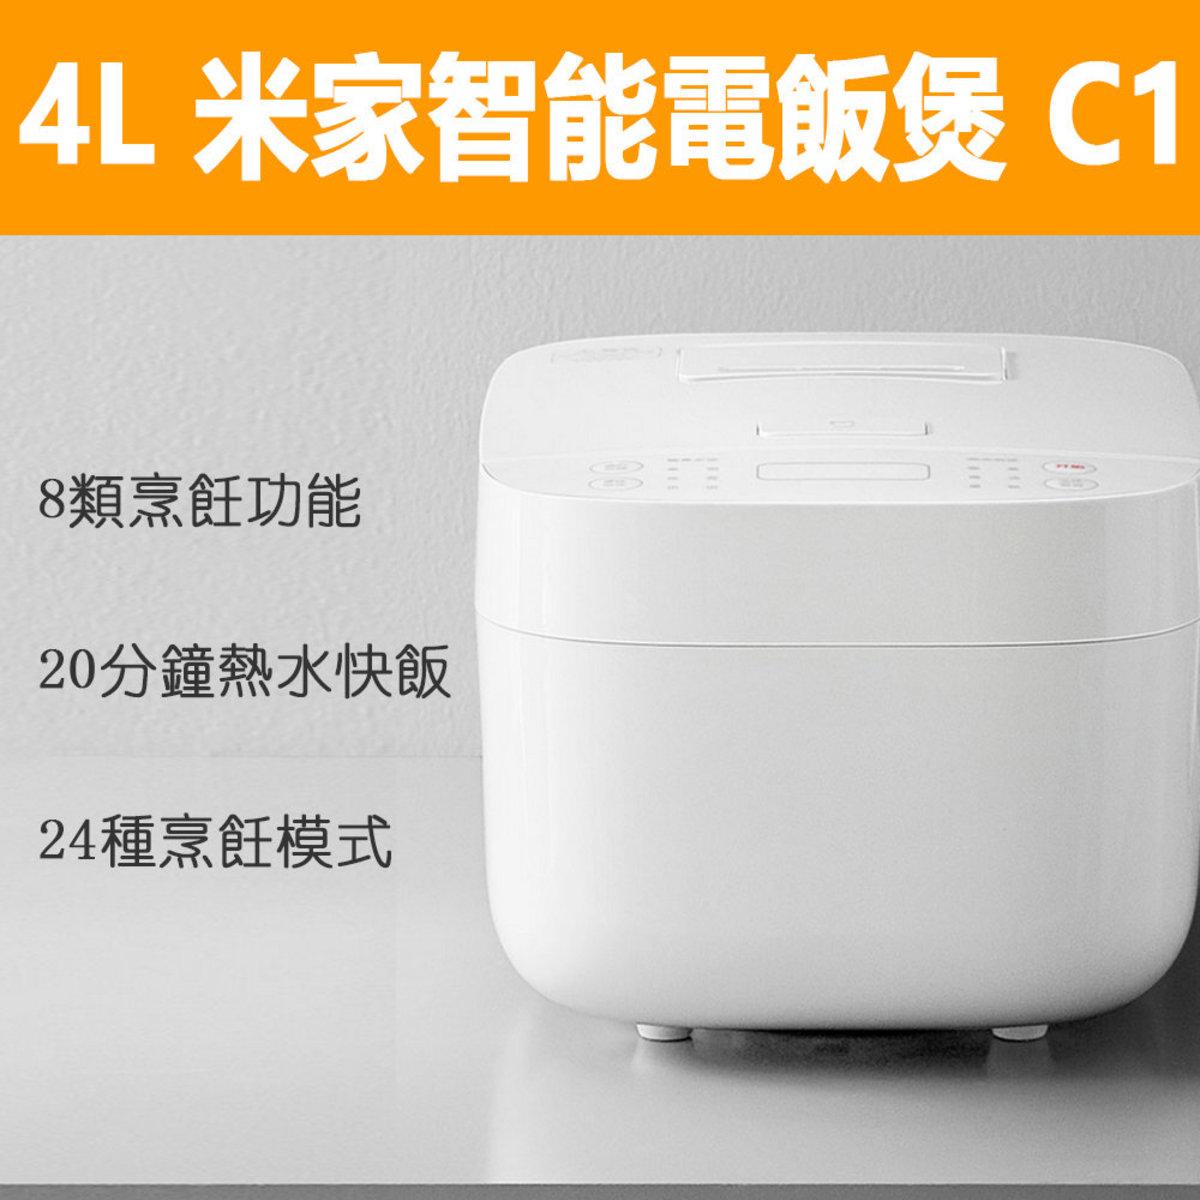 4L Mijia Rice cooker C1 MDFBD03ACM